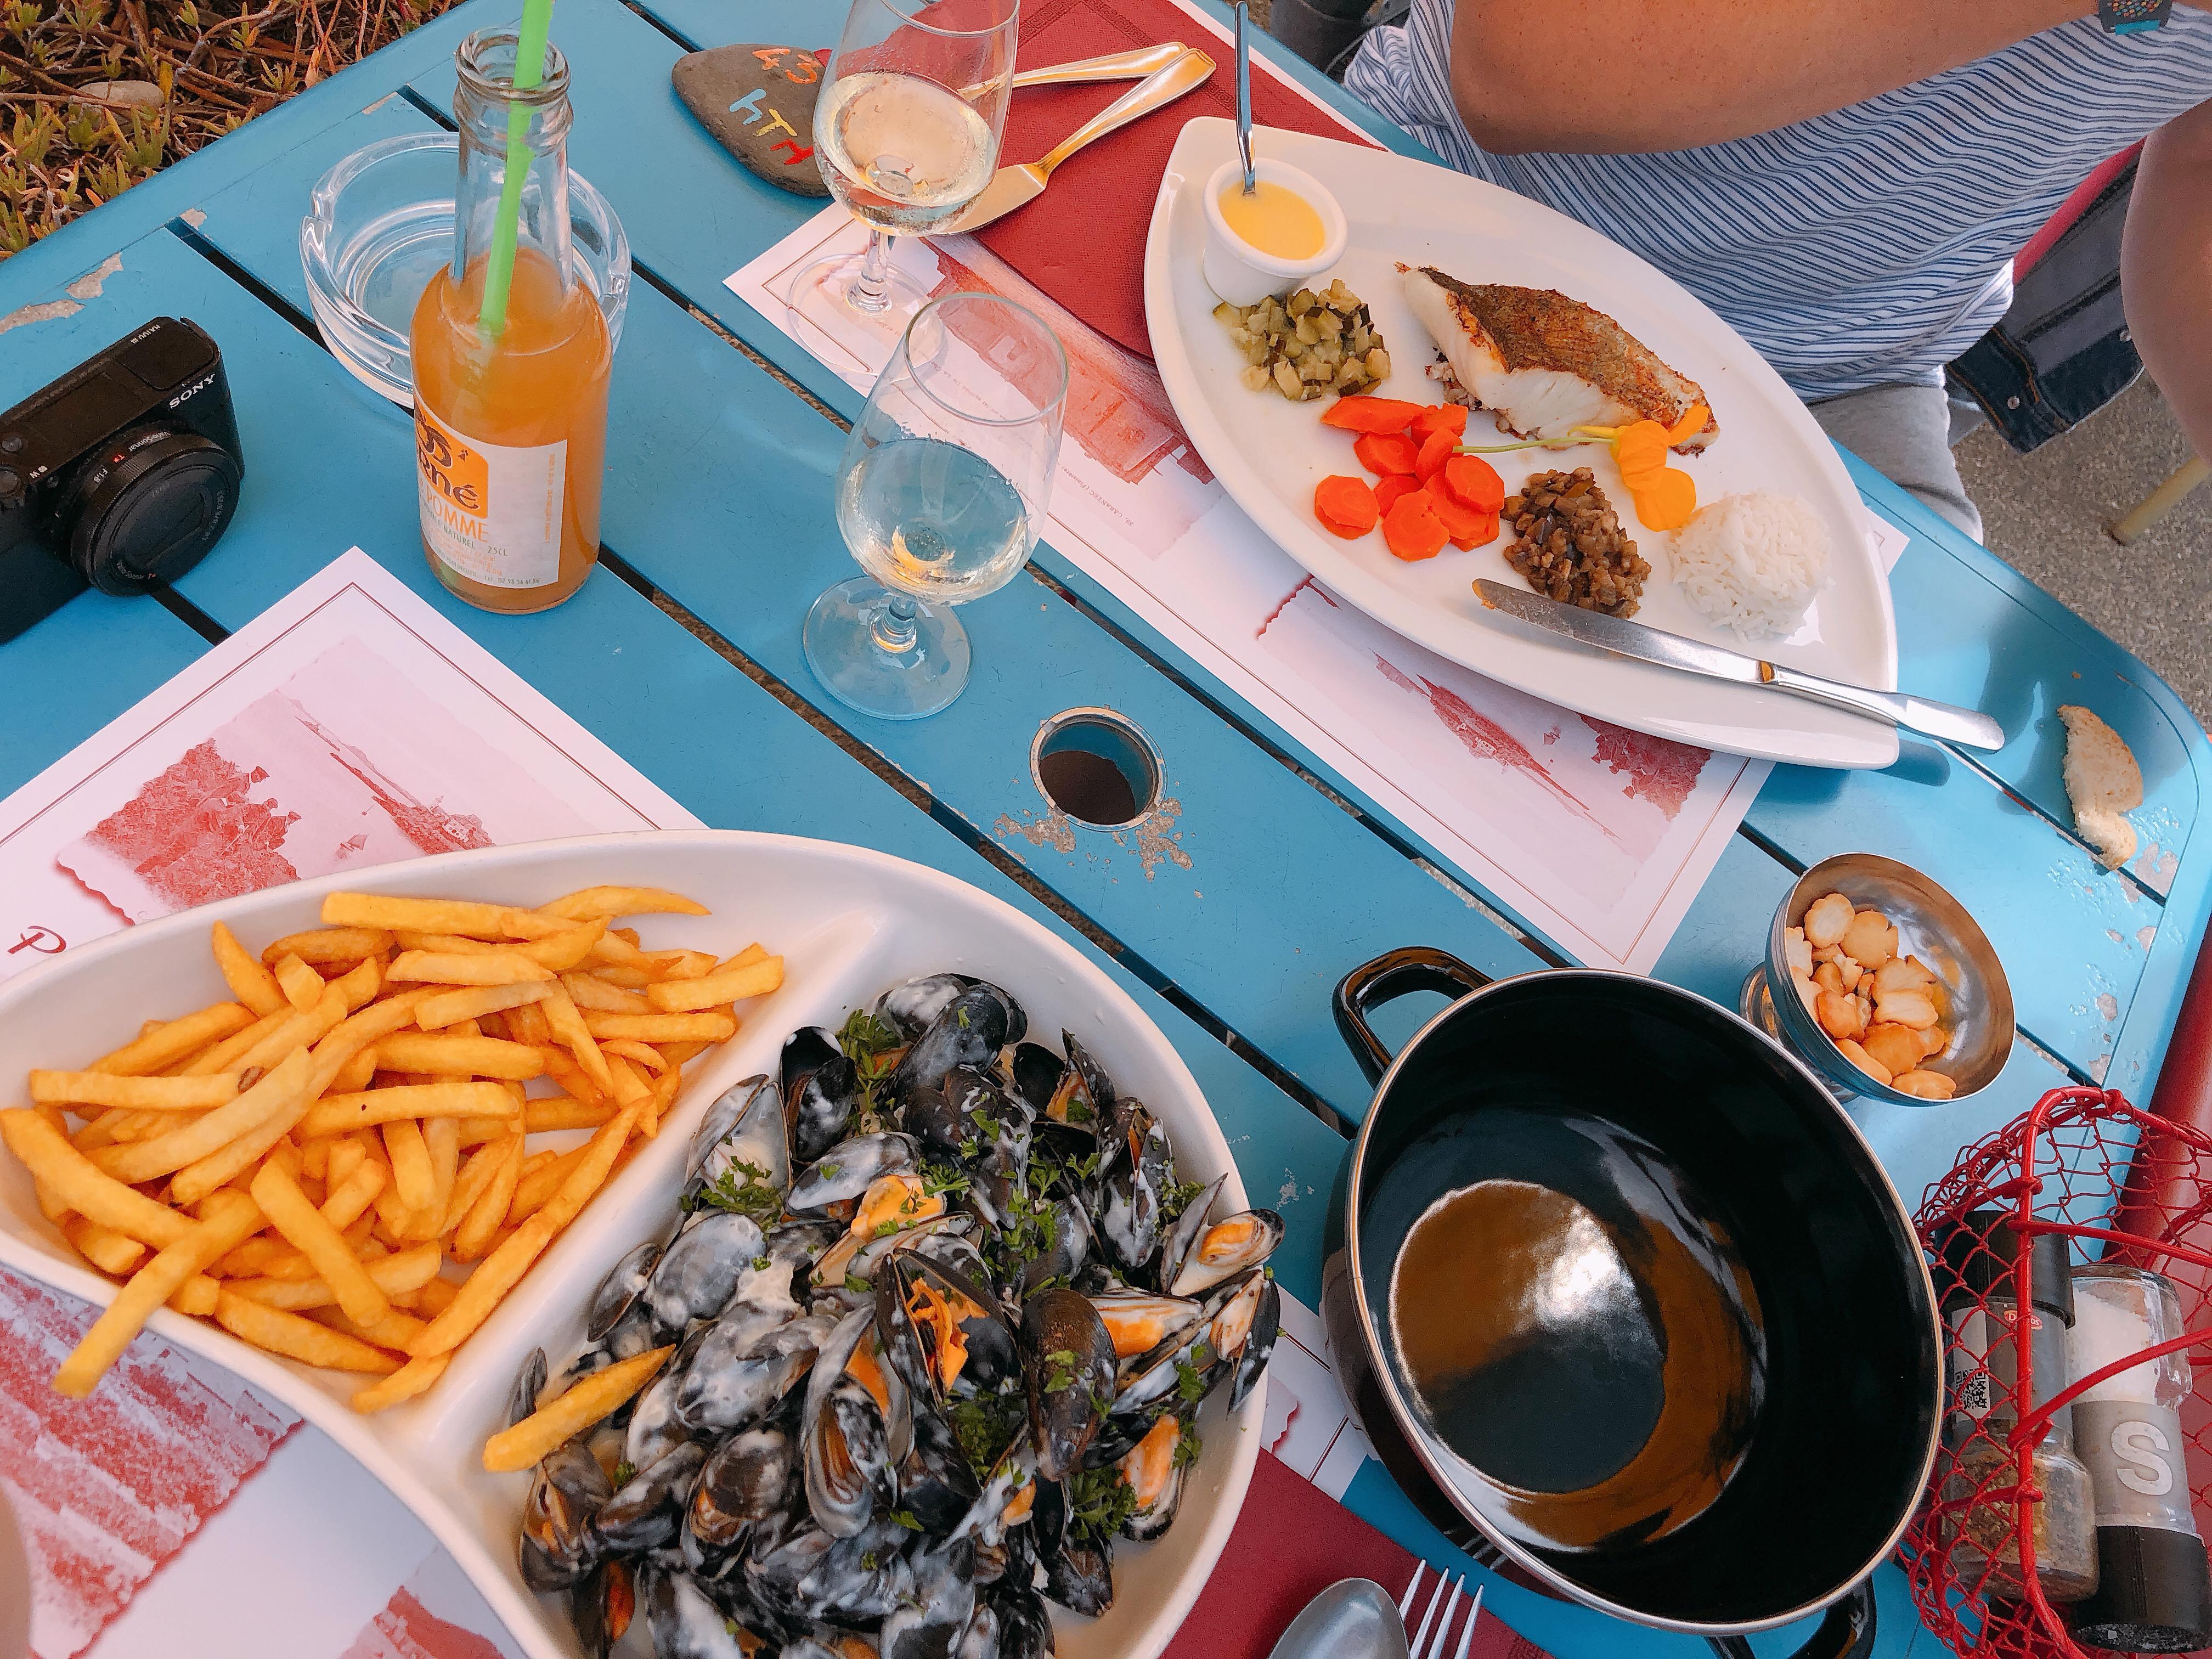 IMG 9428 4032x3024 - Fotodagboek Vakantie: Camping Les Mouettes, Bretagne!